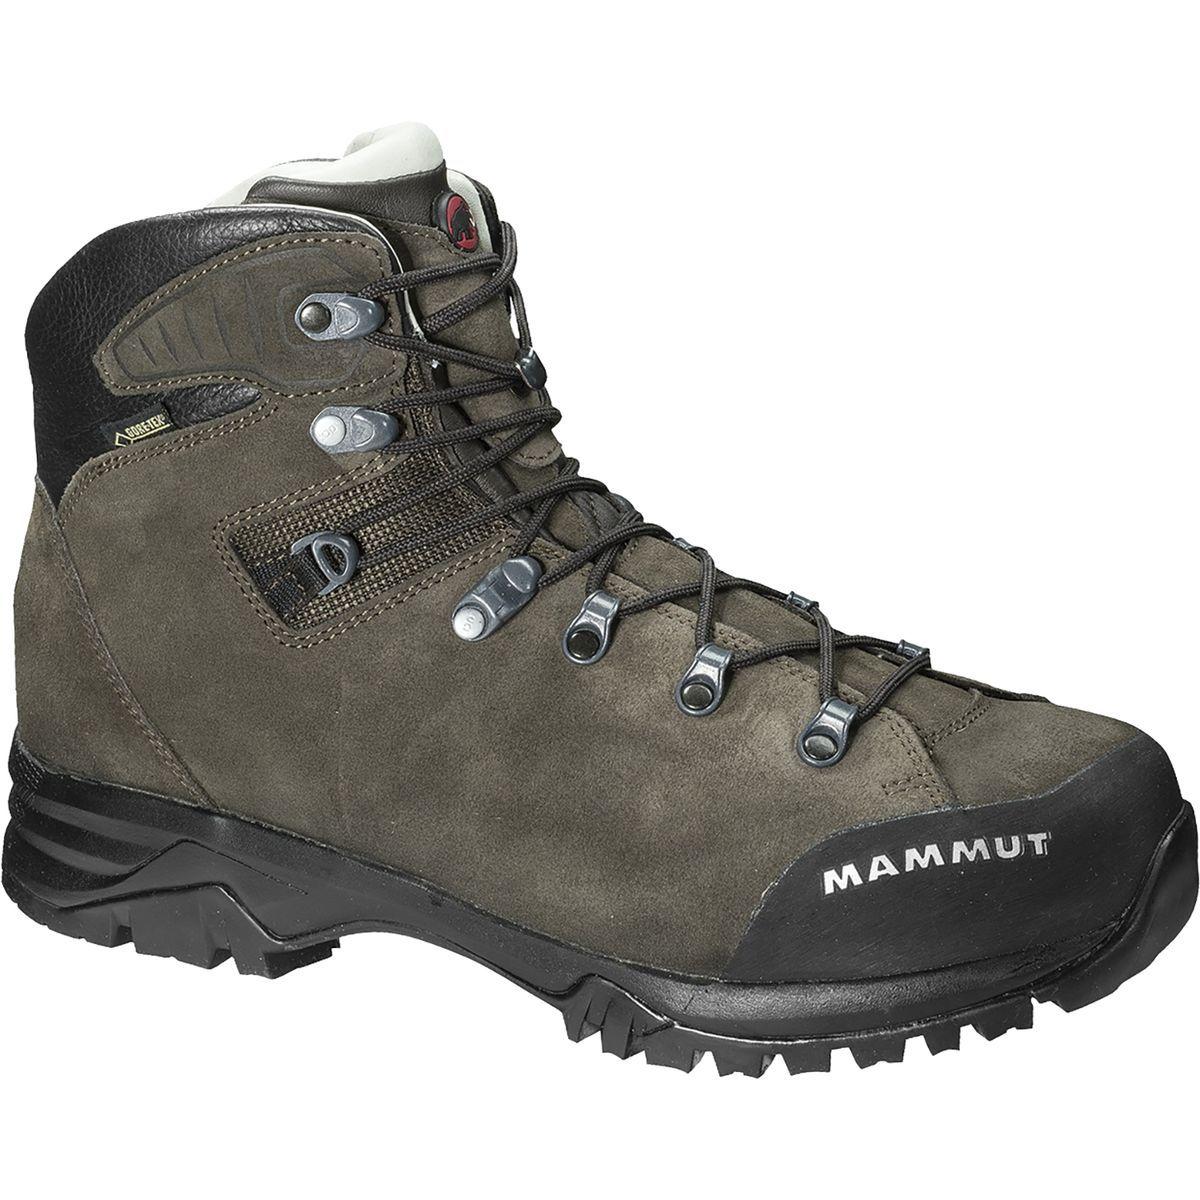 Mammut Trovat High Gtx Hiking Boot Dark Brown Black 11 5